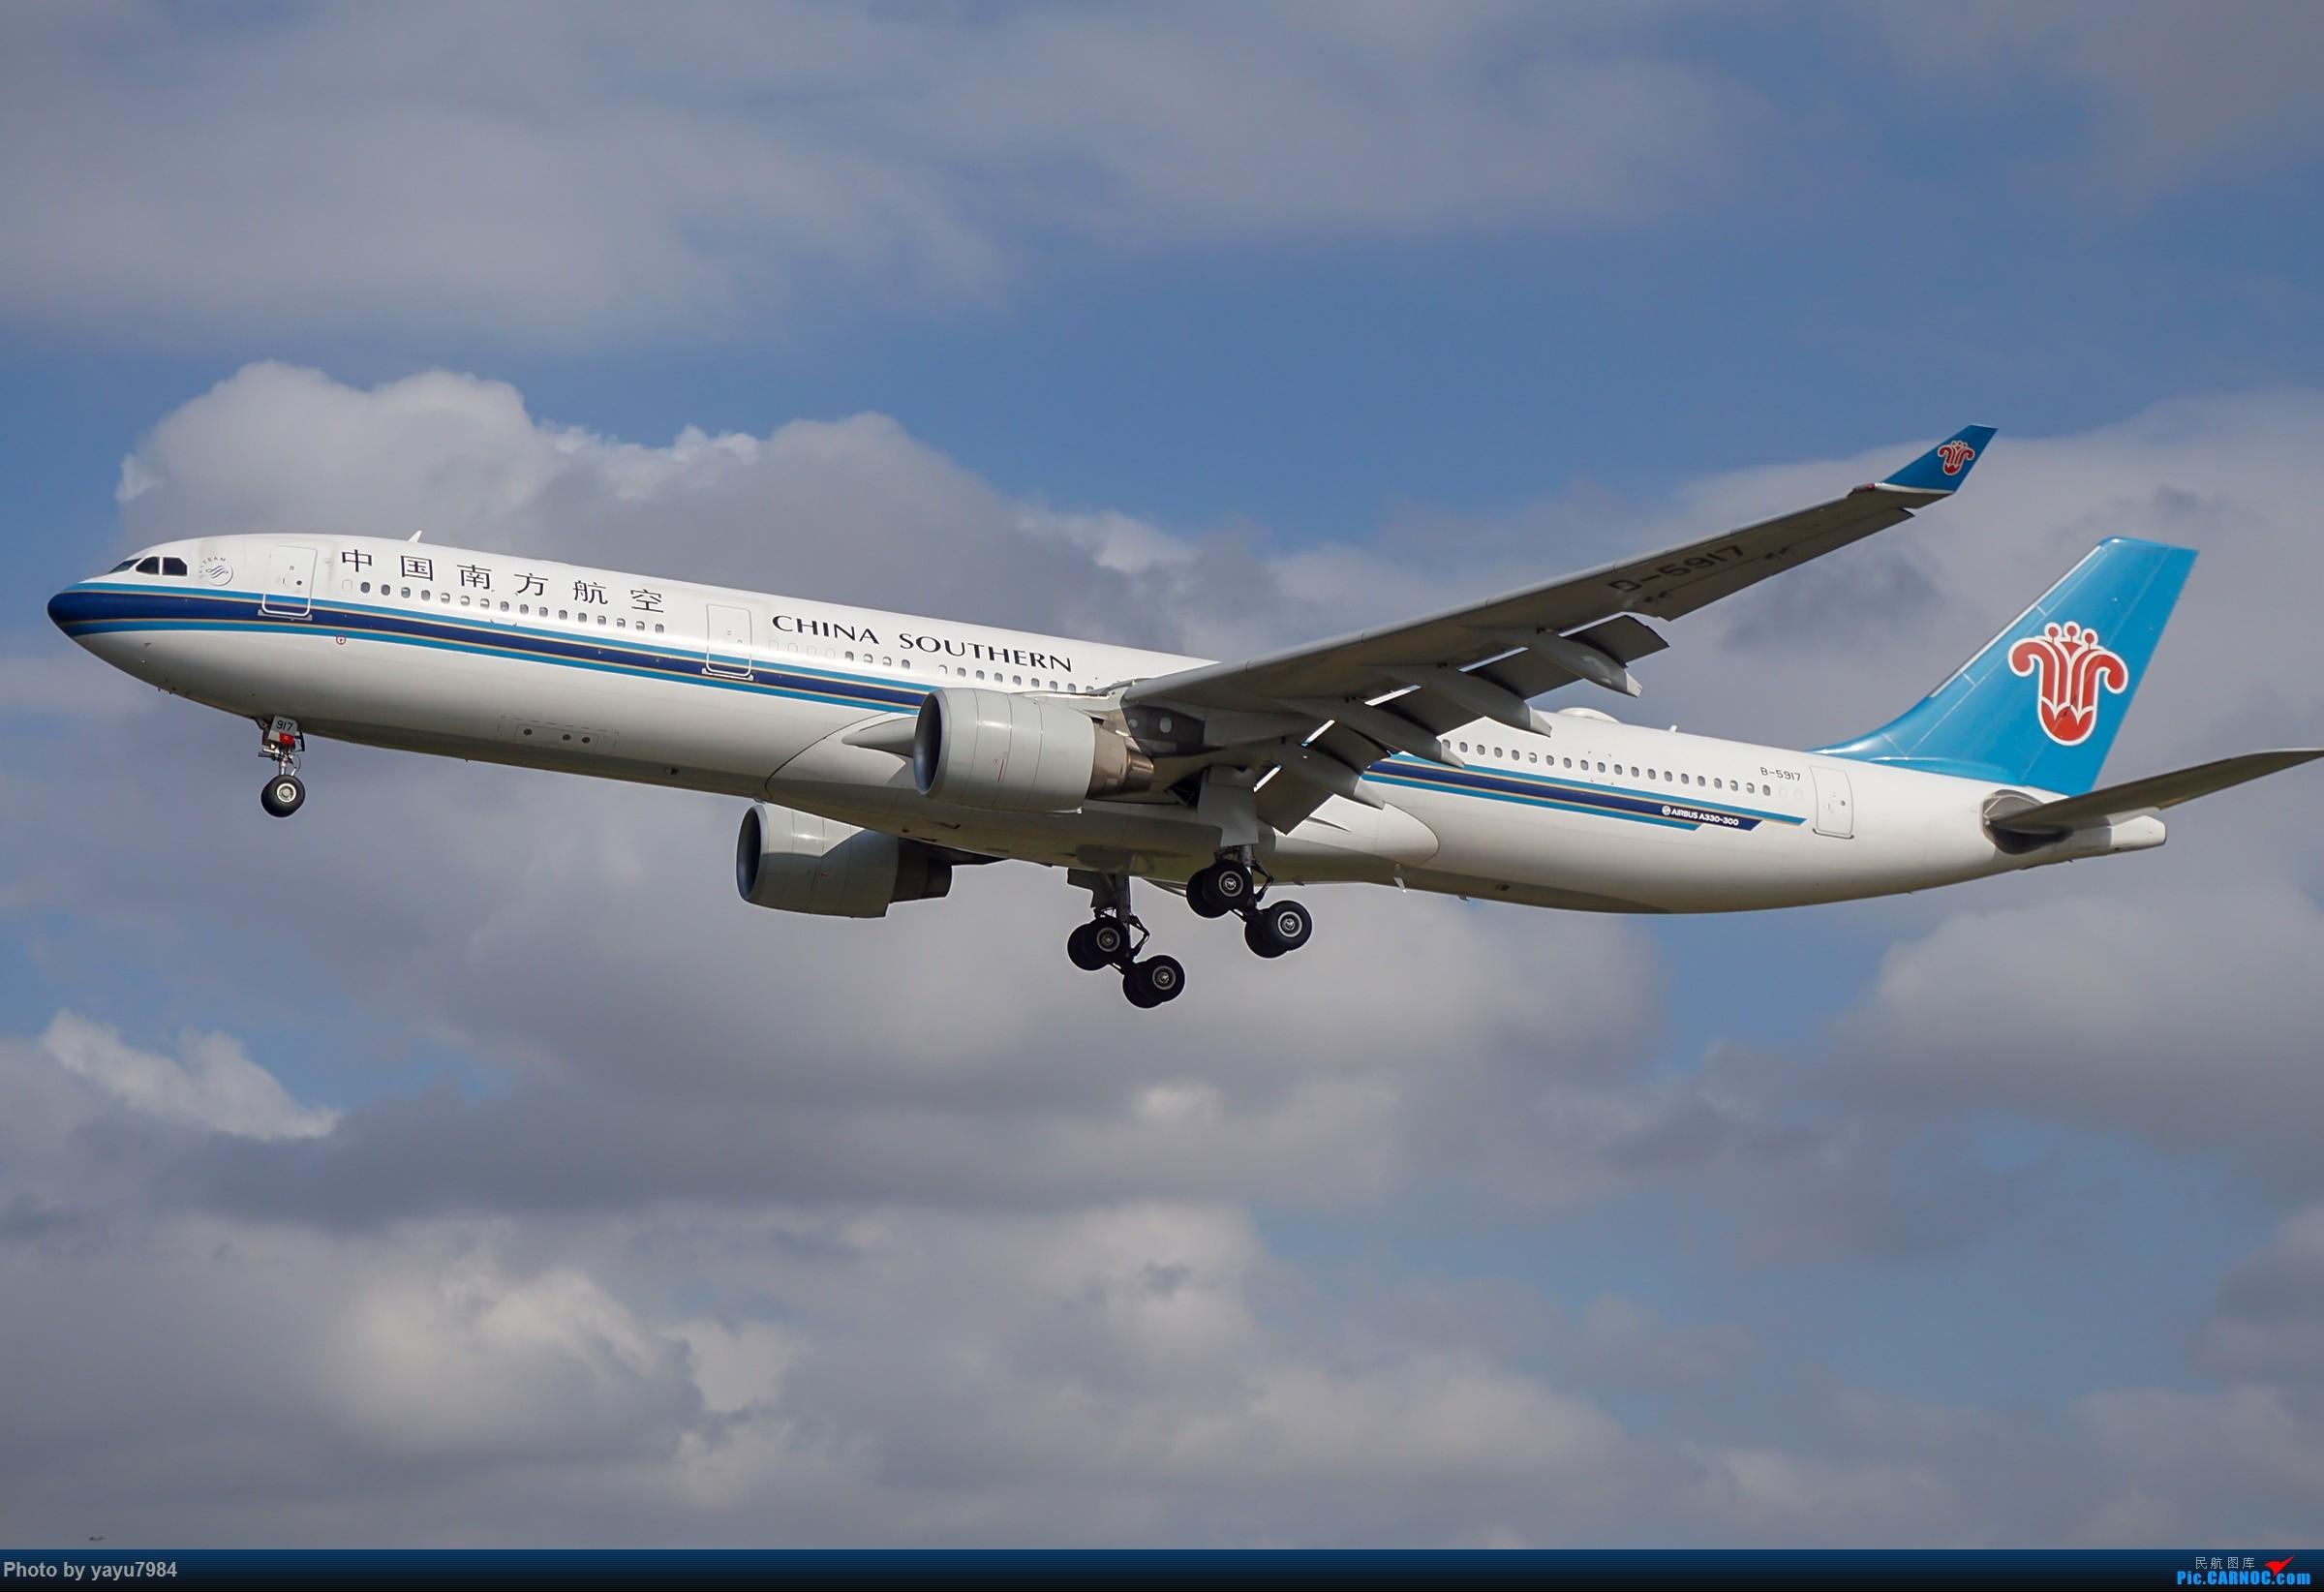 Re:[原创][SYD] 东航天合332,雪绒花343,华航蓝鹊,以及其他日常货 AIRBUS A330-300 B-5917 澳大利亚悉尼金斯福德·史密斯机场